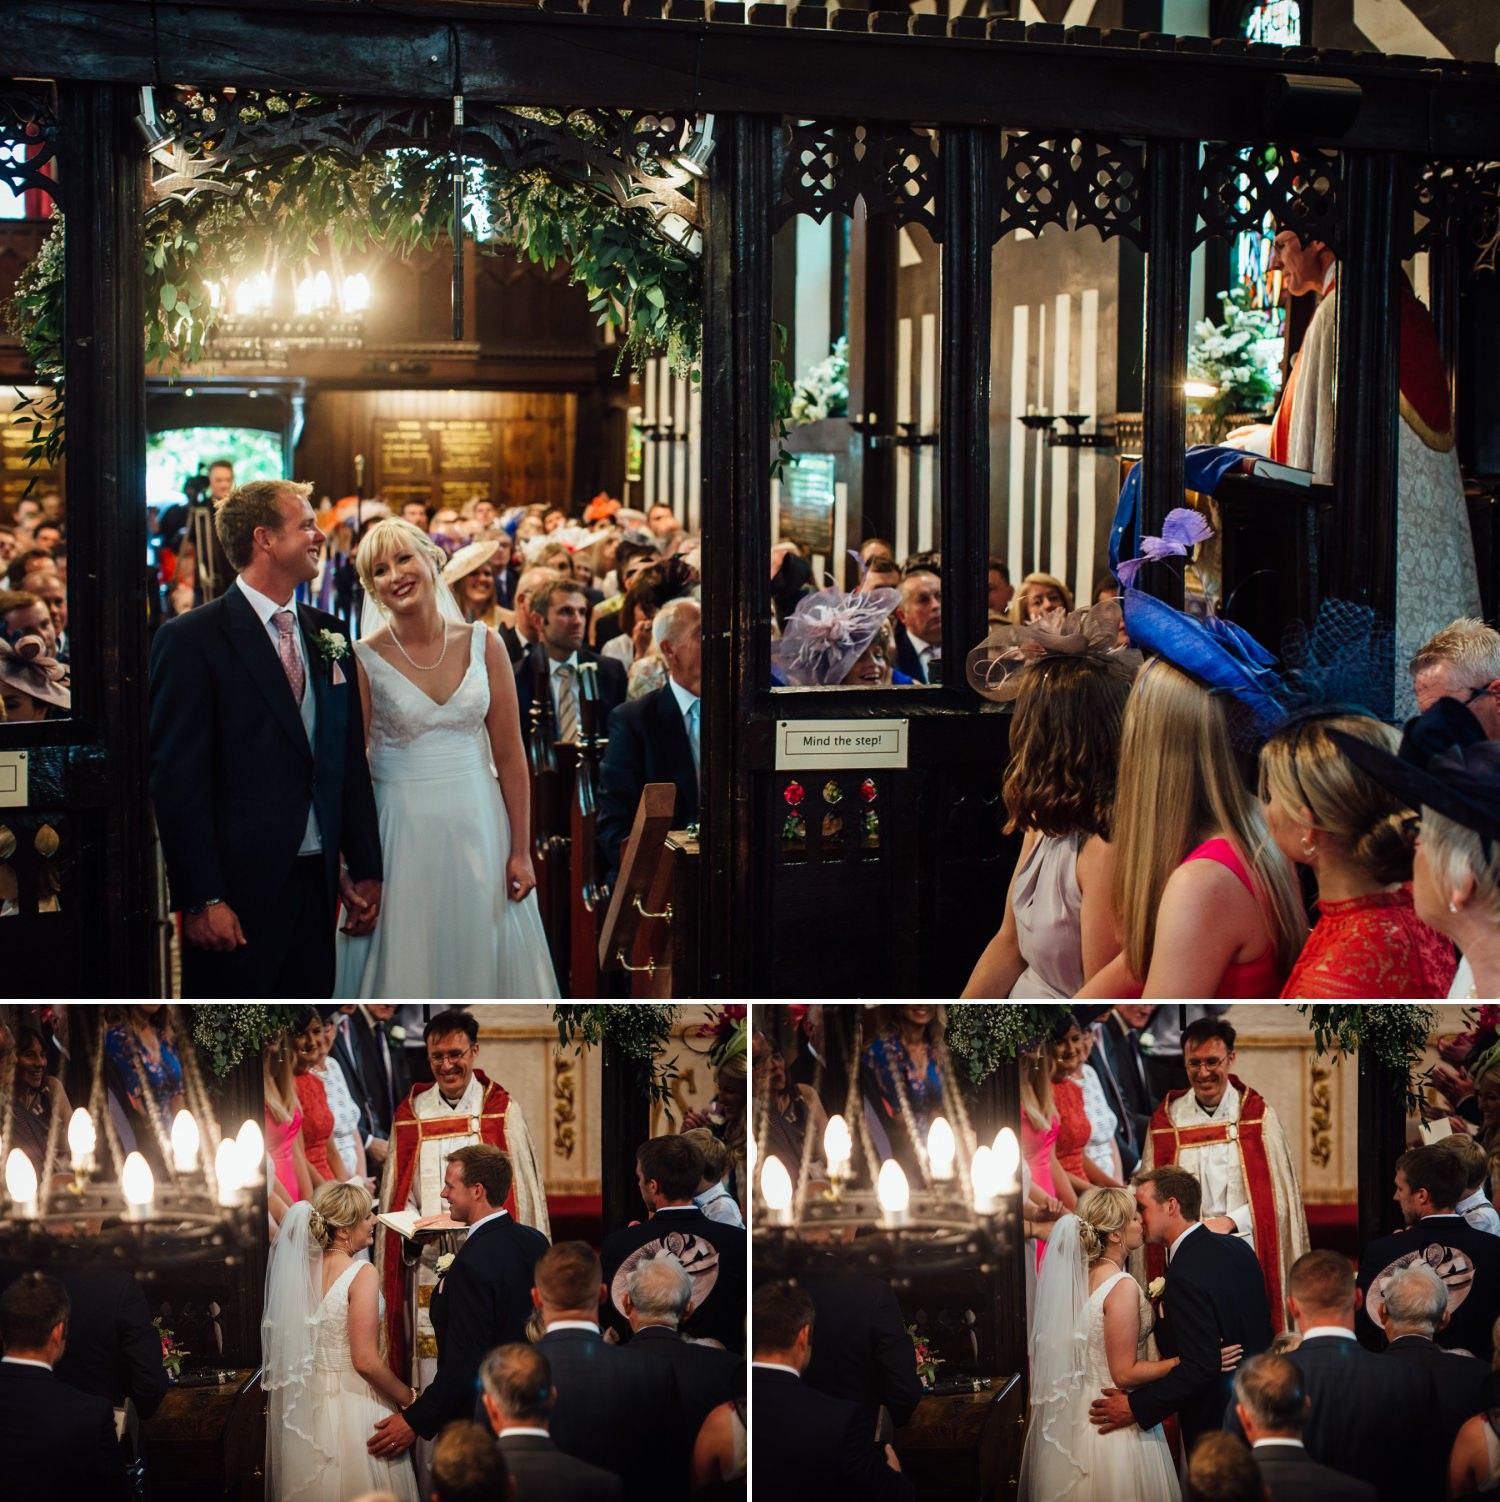 Siddington Church, Macclesfield wedding photo of ceremony